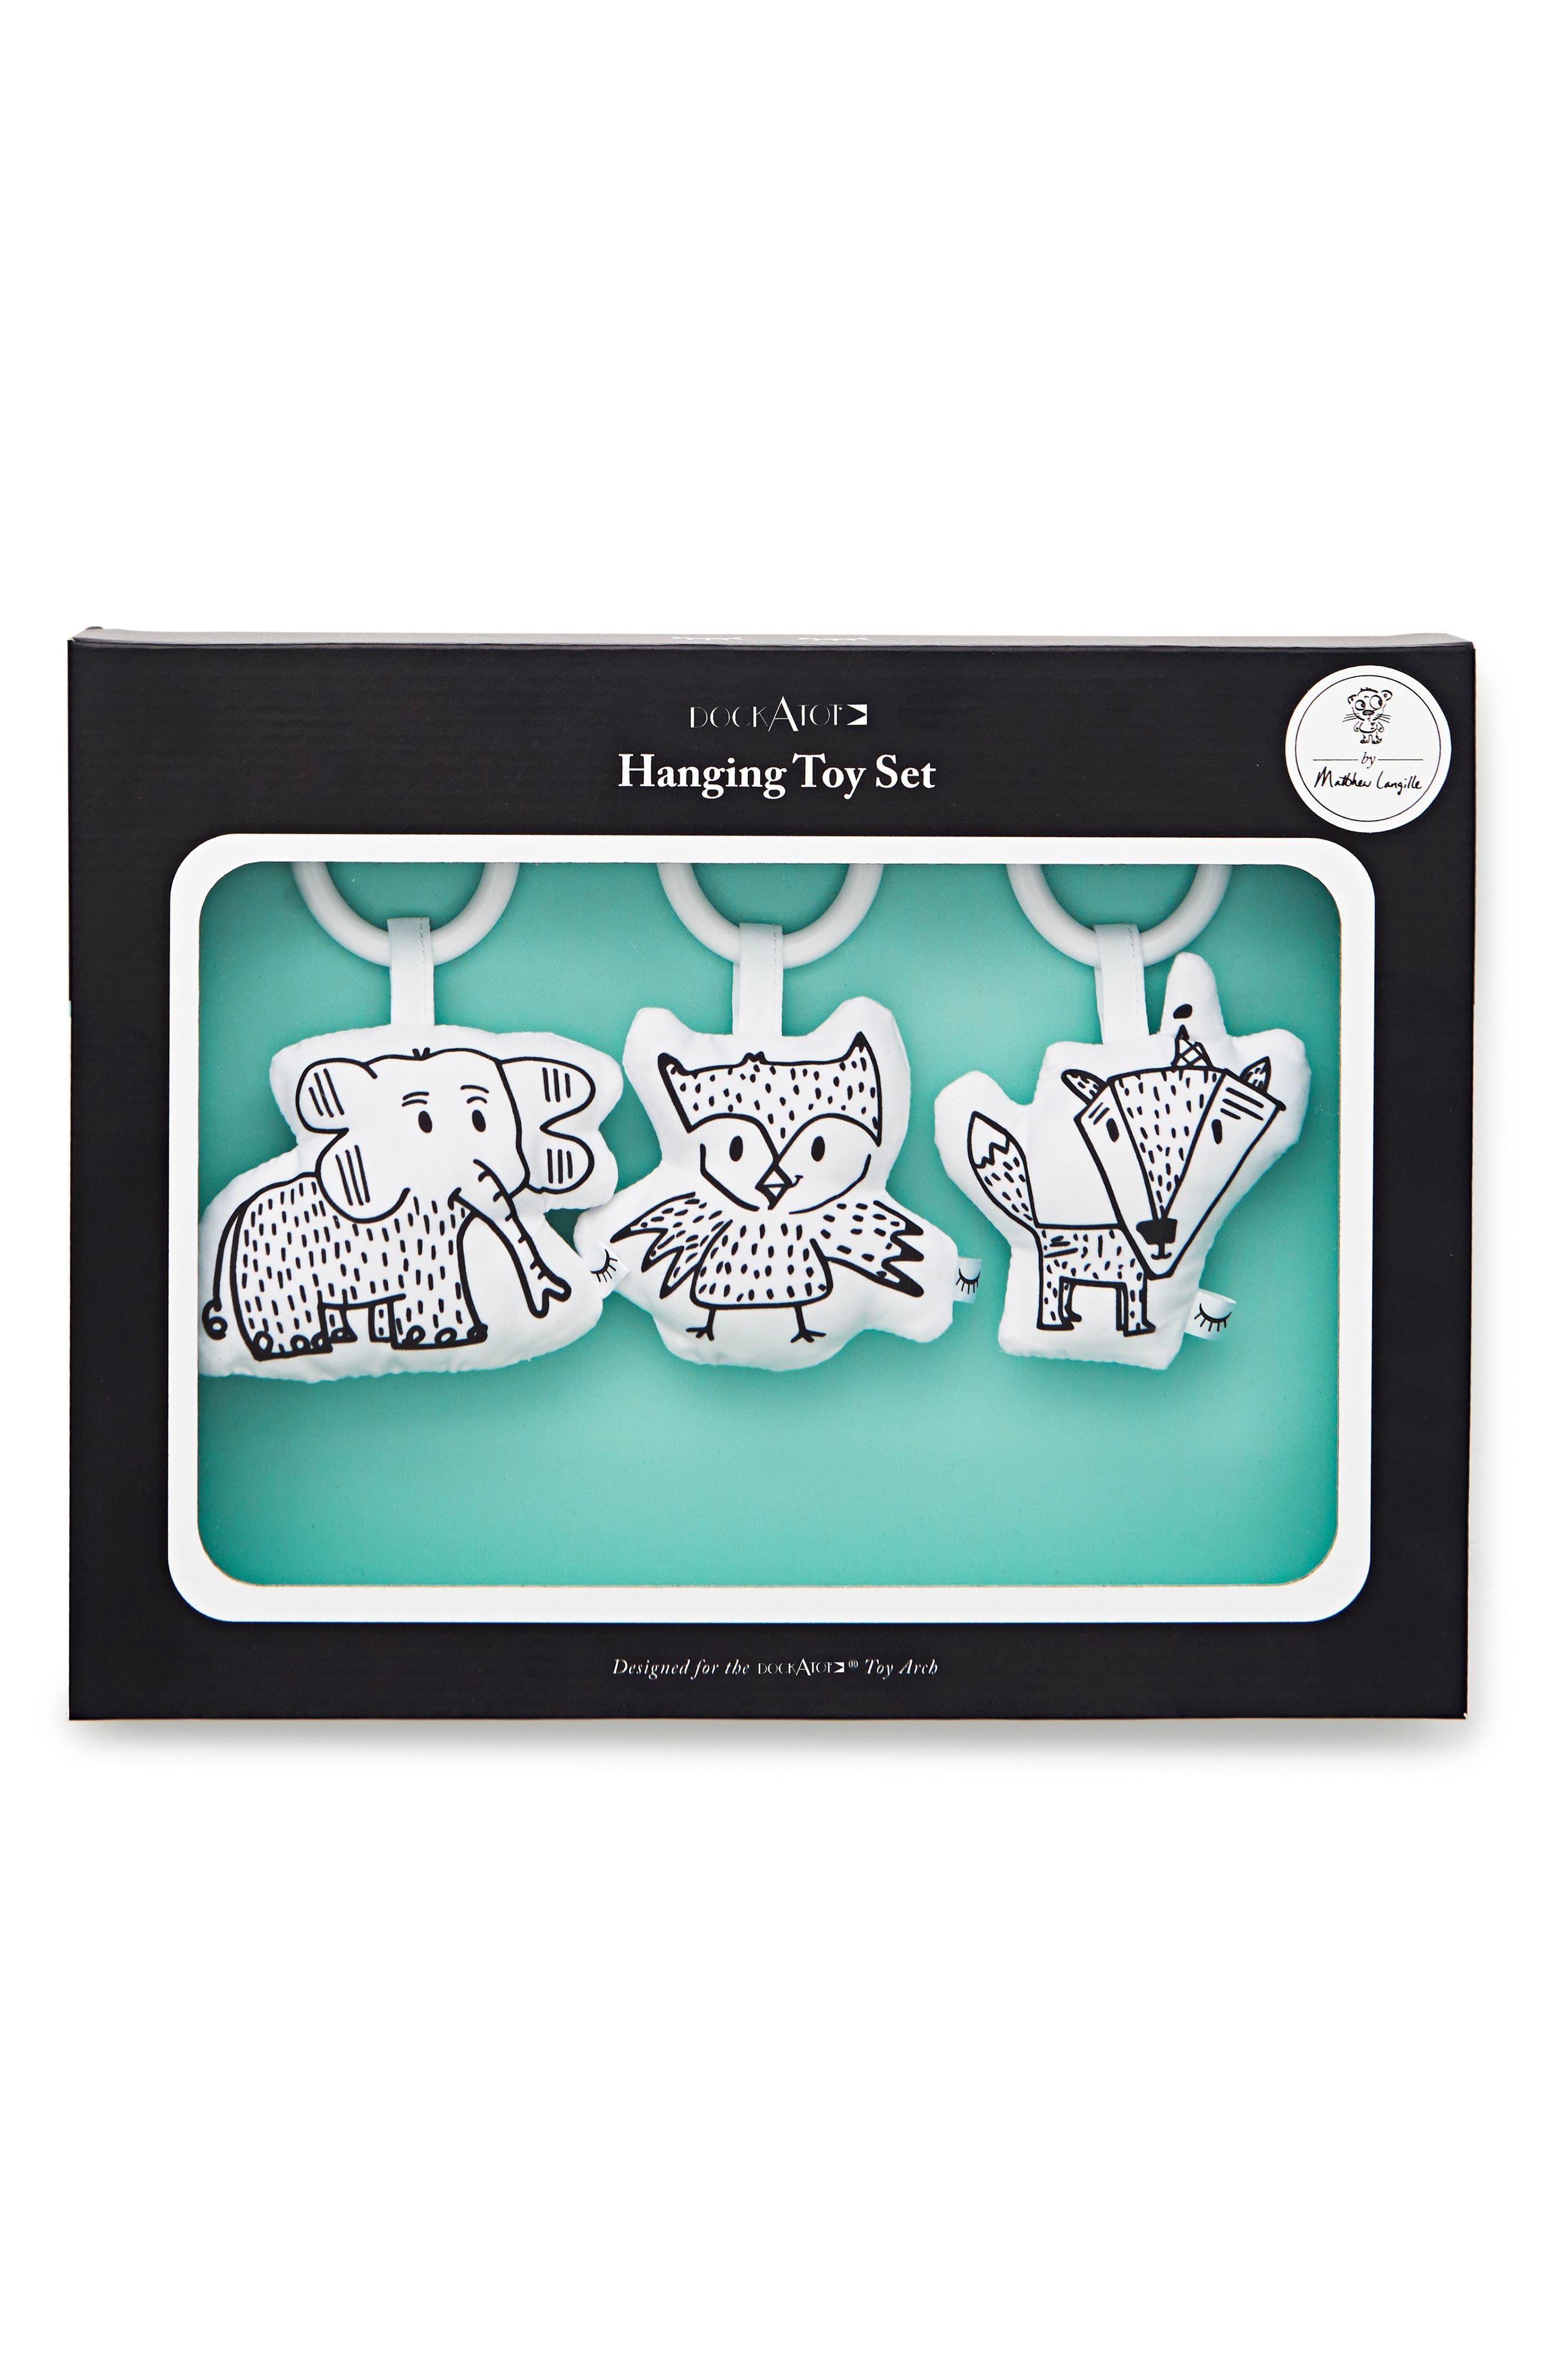 3-Piece Hanging Toy Set,                             Alternate thumbnail 3, color,                             Black/ White